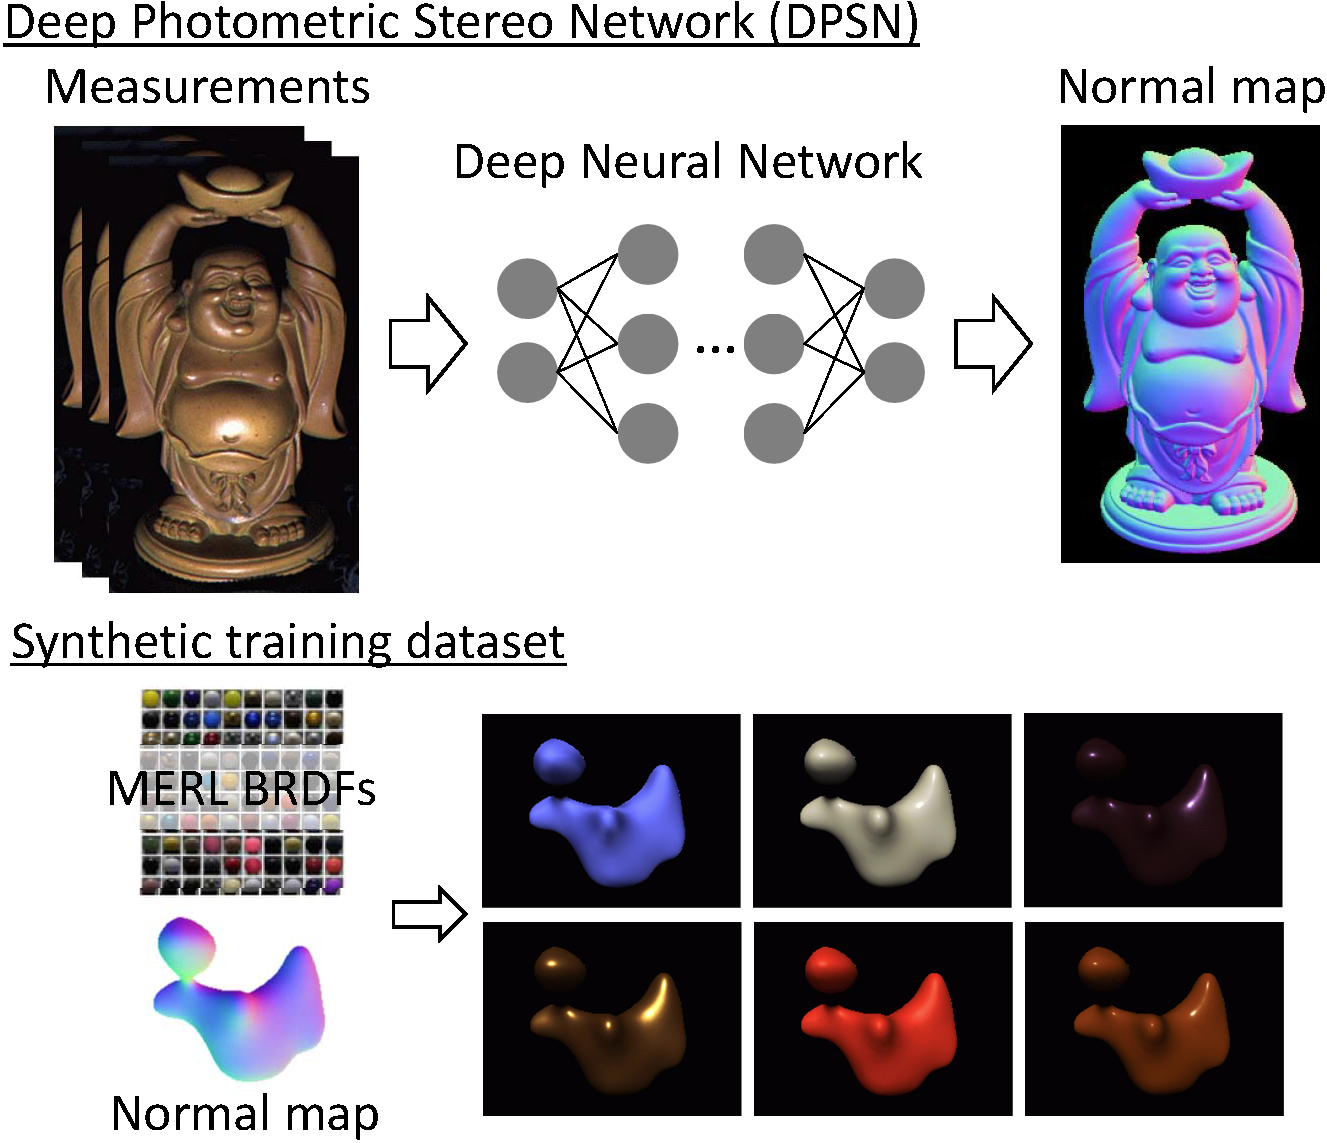 Deep Photometric Stereo Network